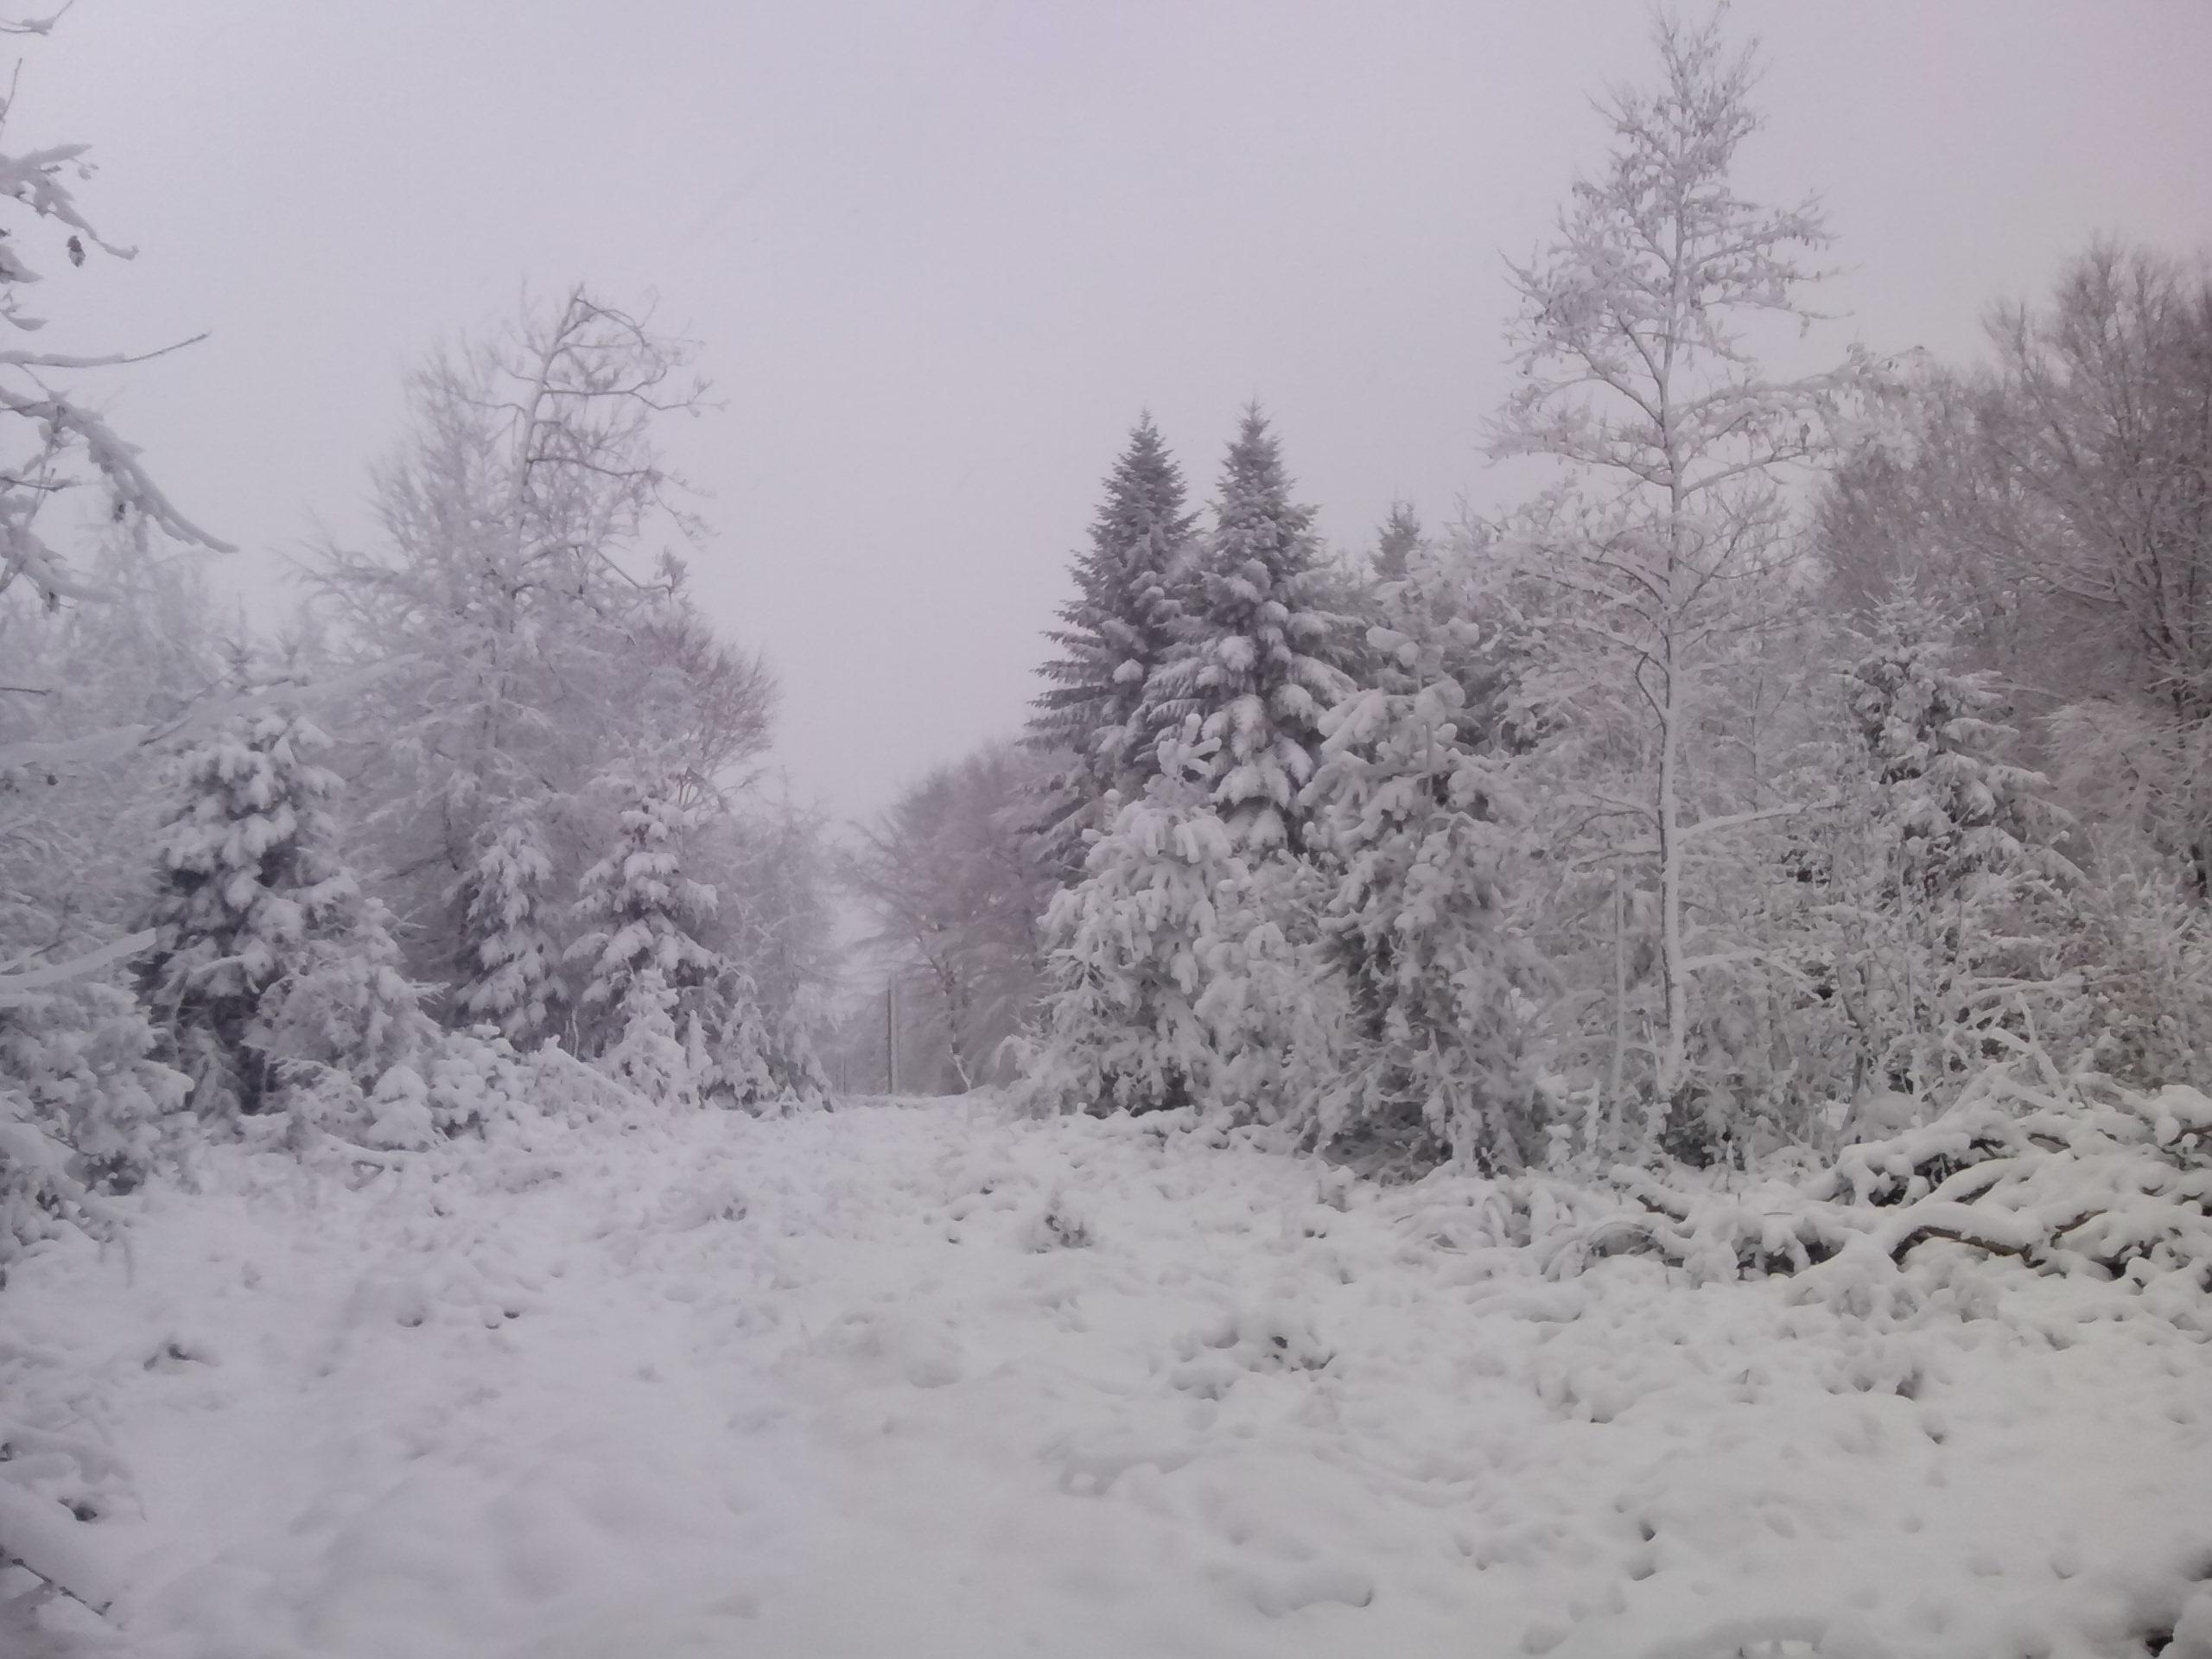 Noch immer fällt auch am 28.Dezember 2014 noch Schnee...